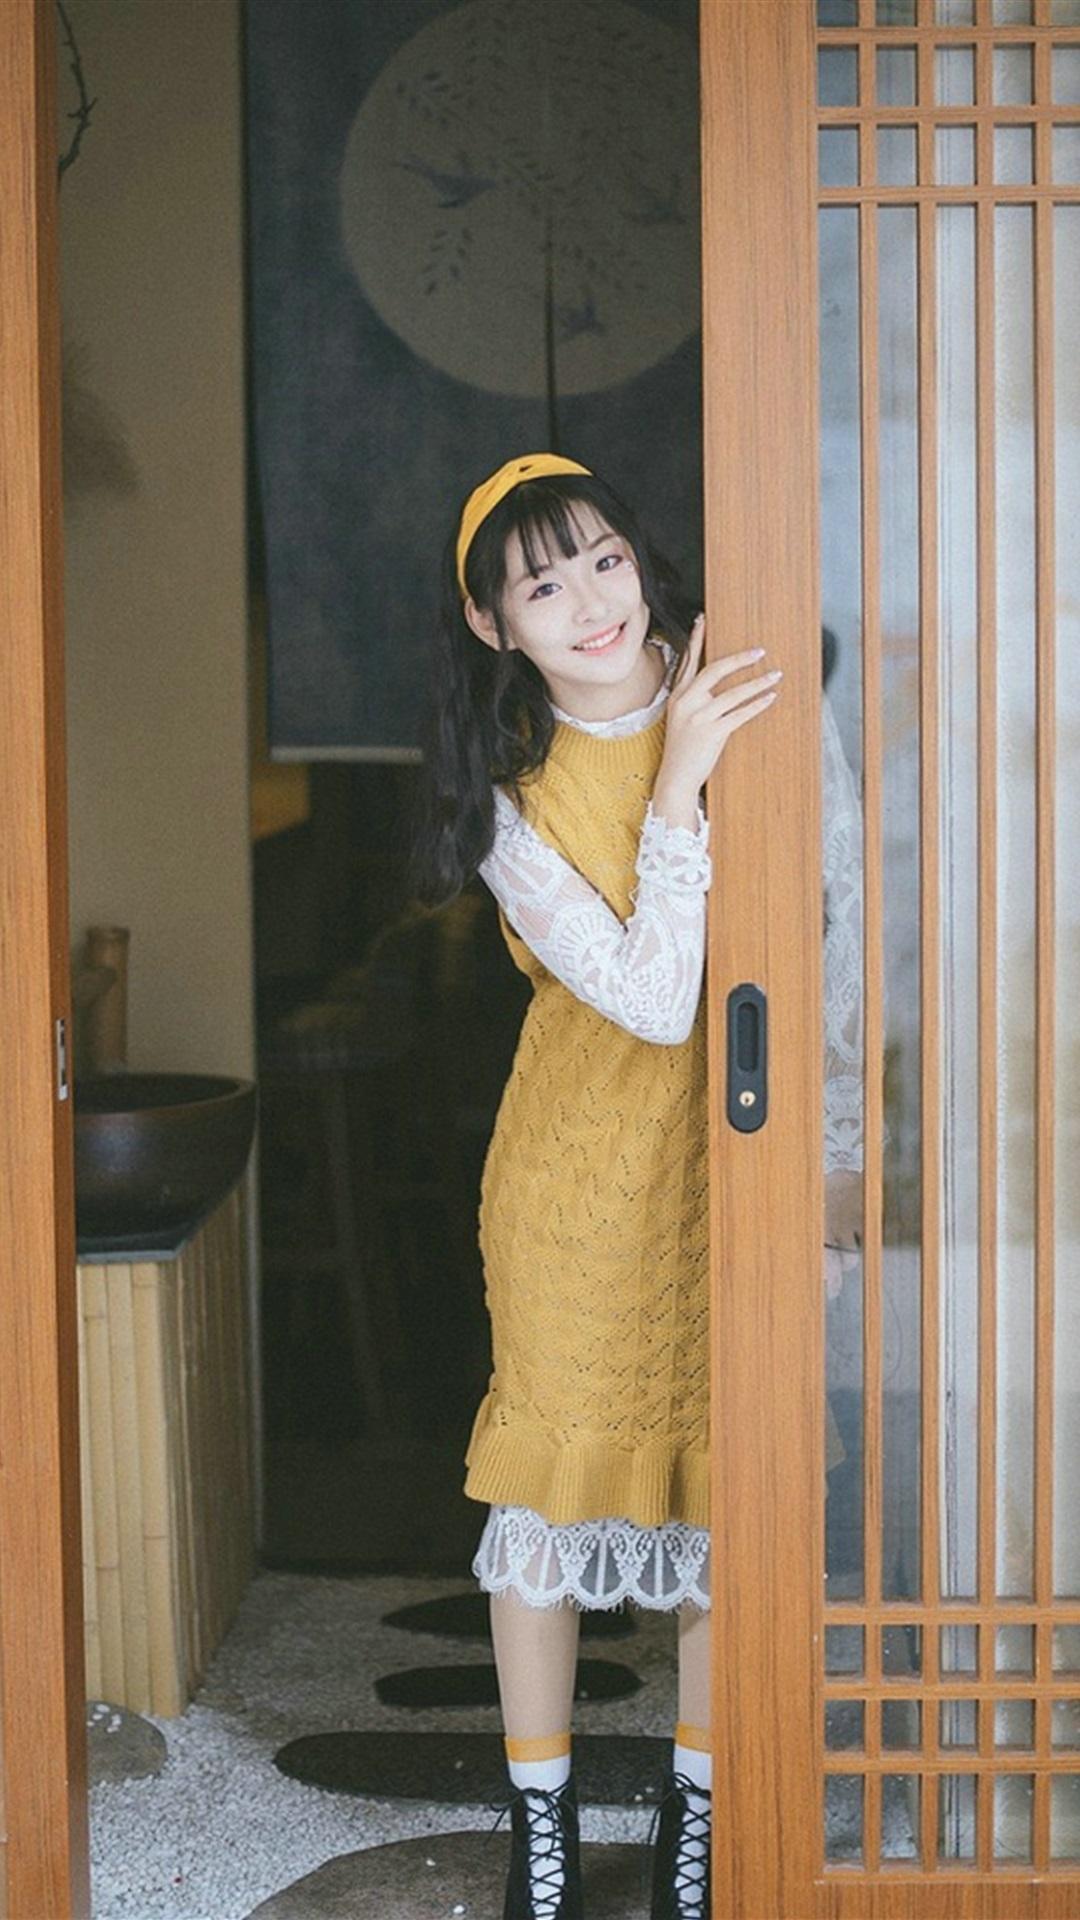 【v粉壁纸】可爱萌妹【9p】